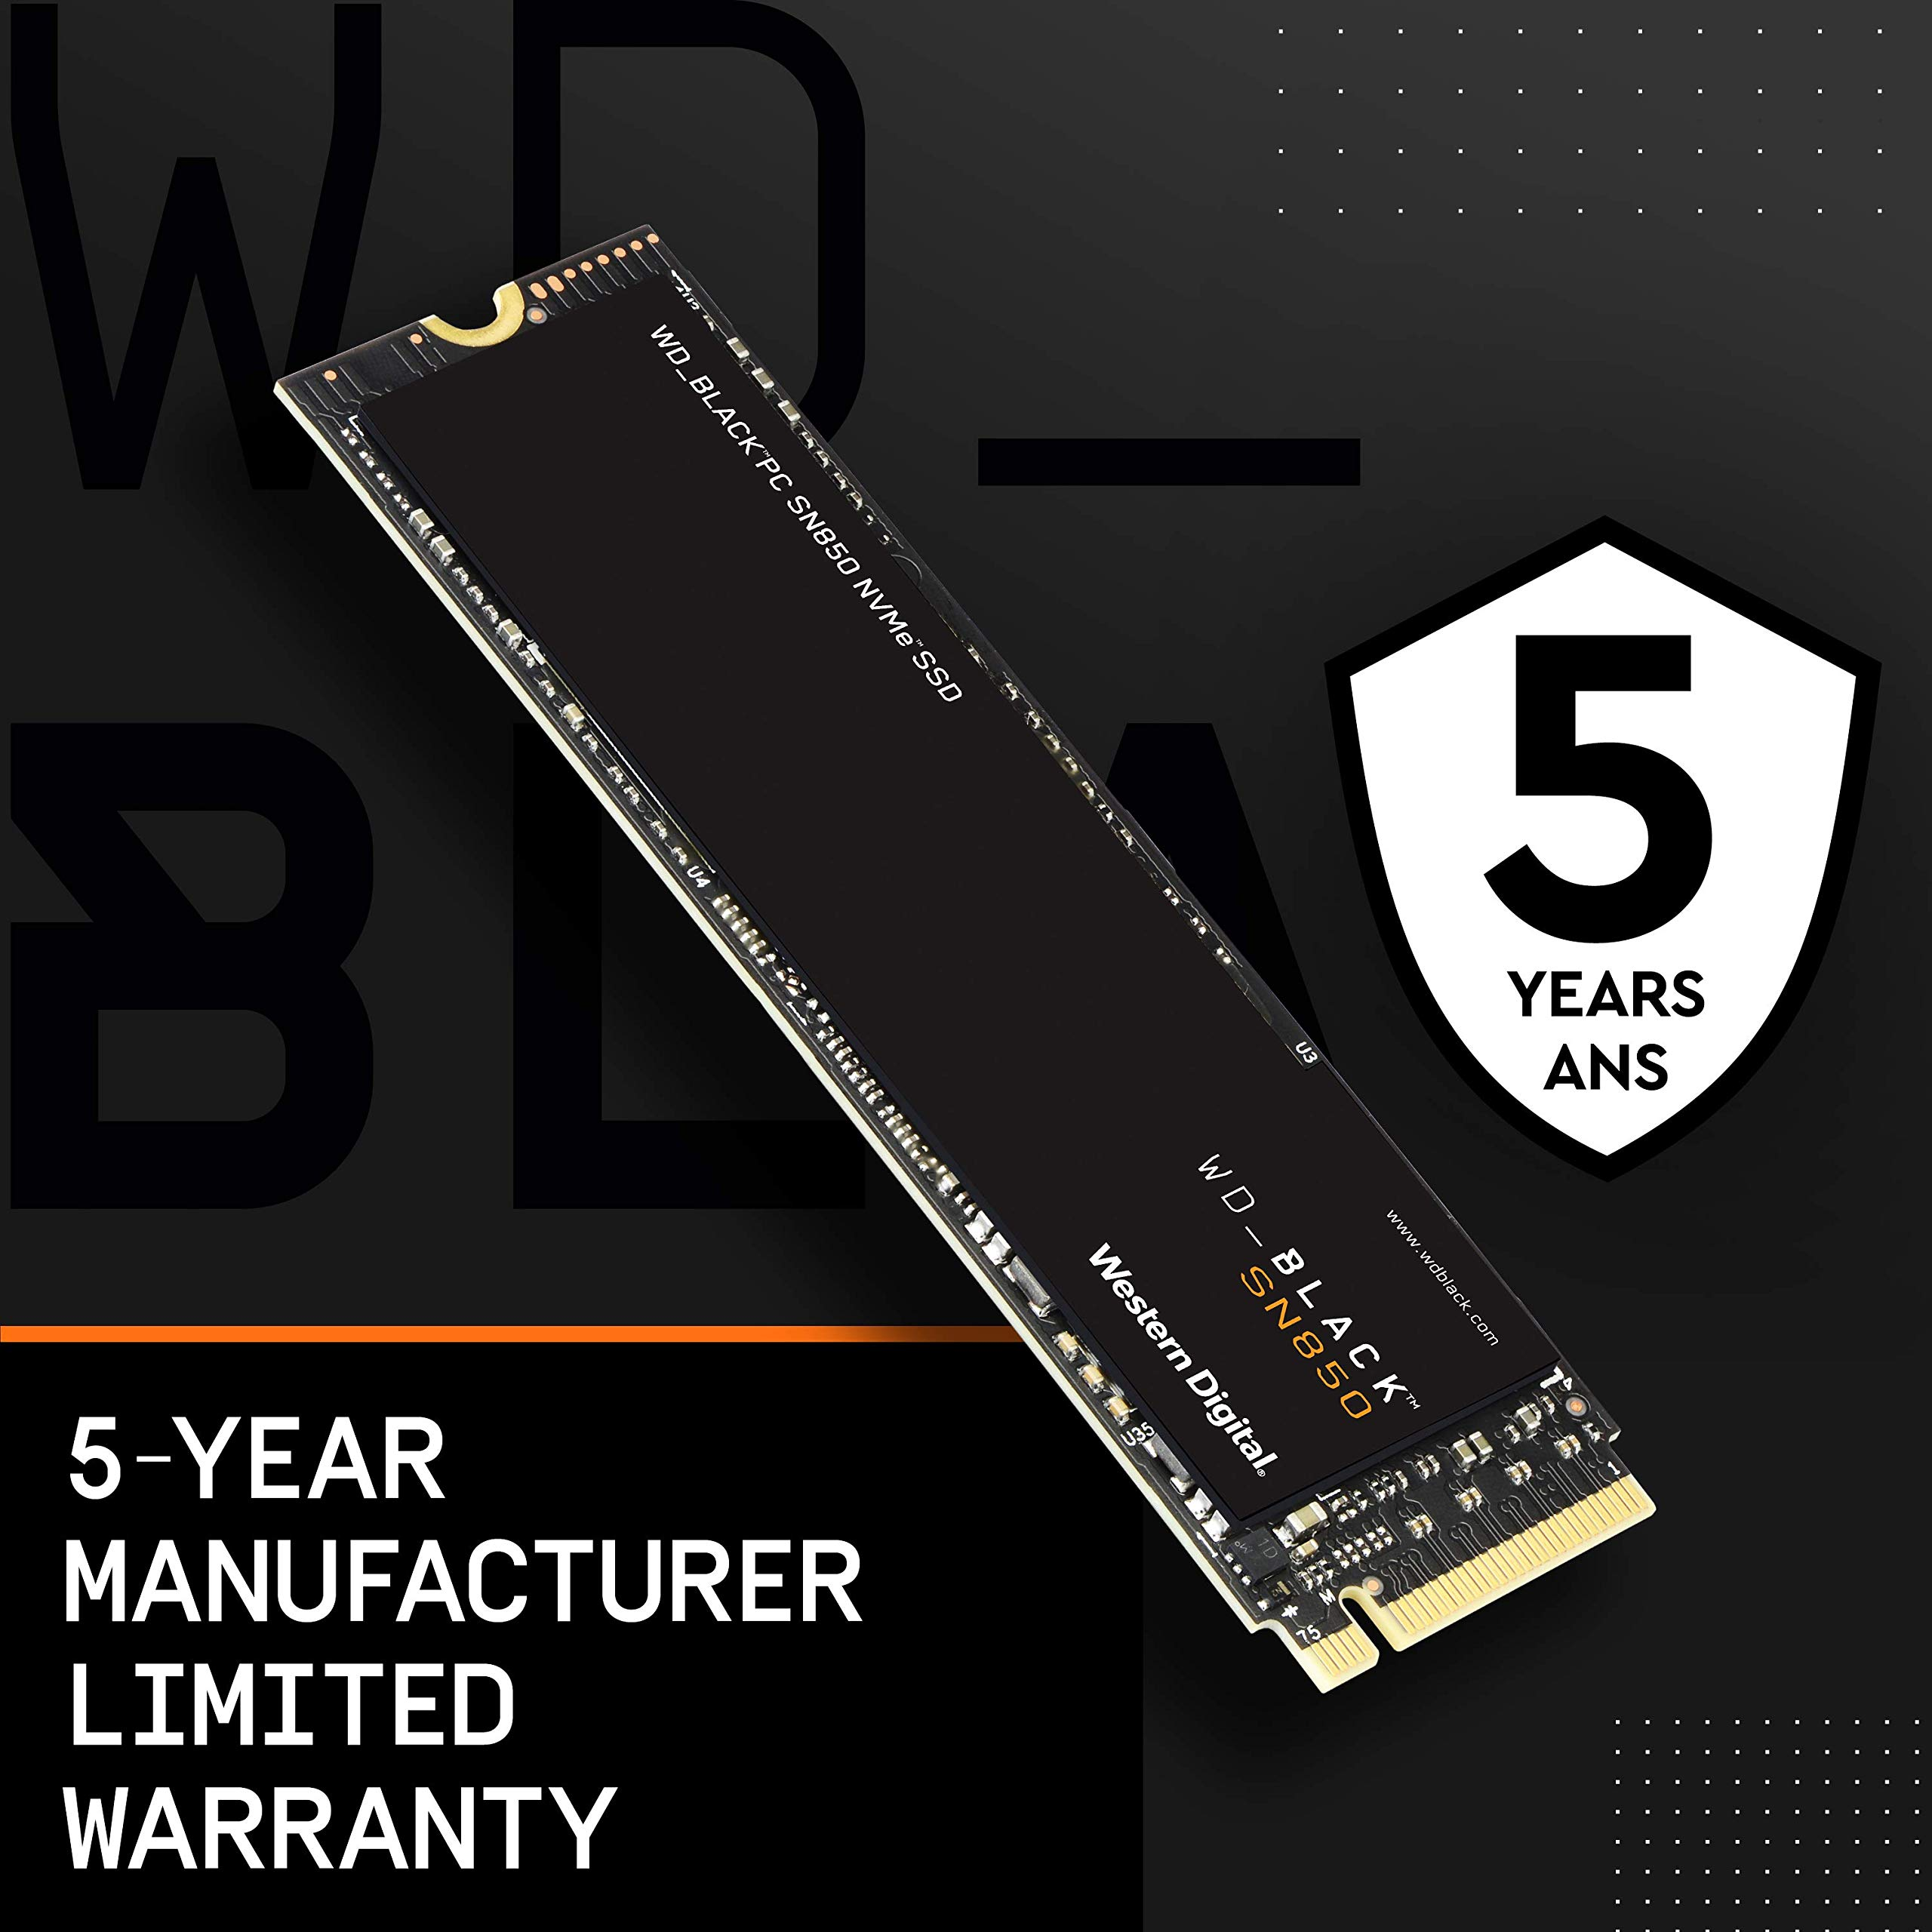 WD_BLACK 1TB SN850 NVMe Internal Gaming SSD Solid State Drive - Gen4 PCIe, M.2 2280, 3D NAND, Up to 7,000 MB/s - WDS100T1X0E